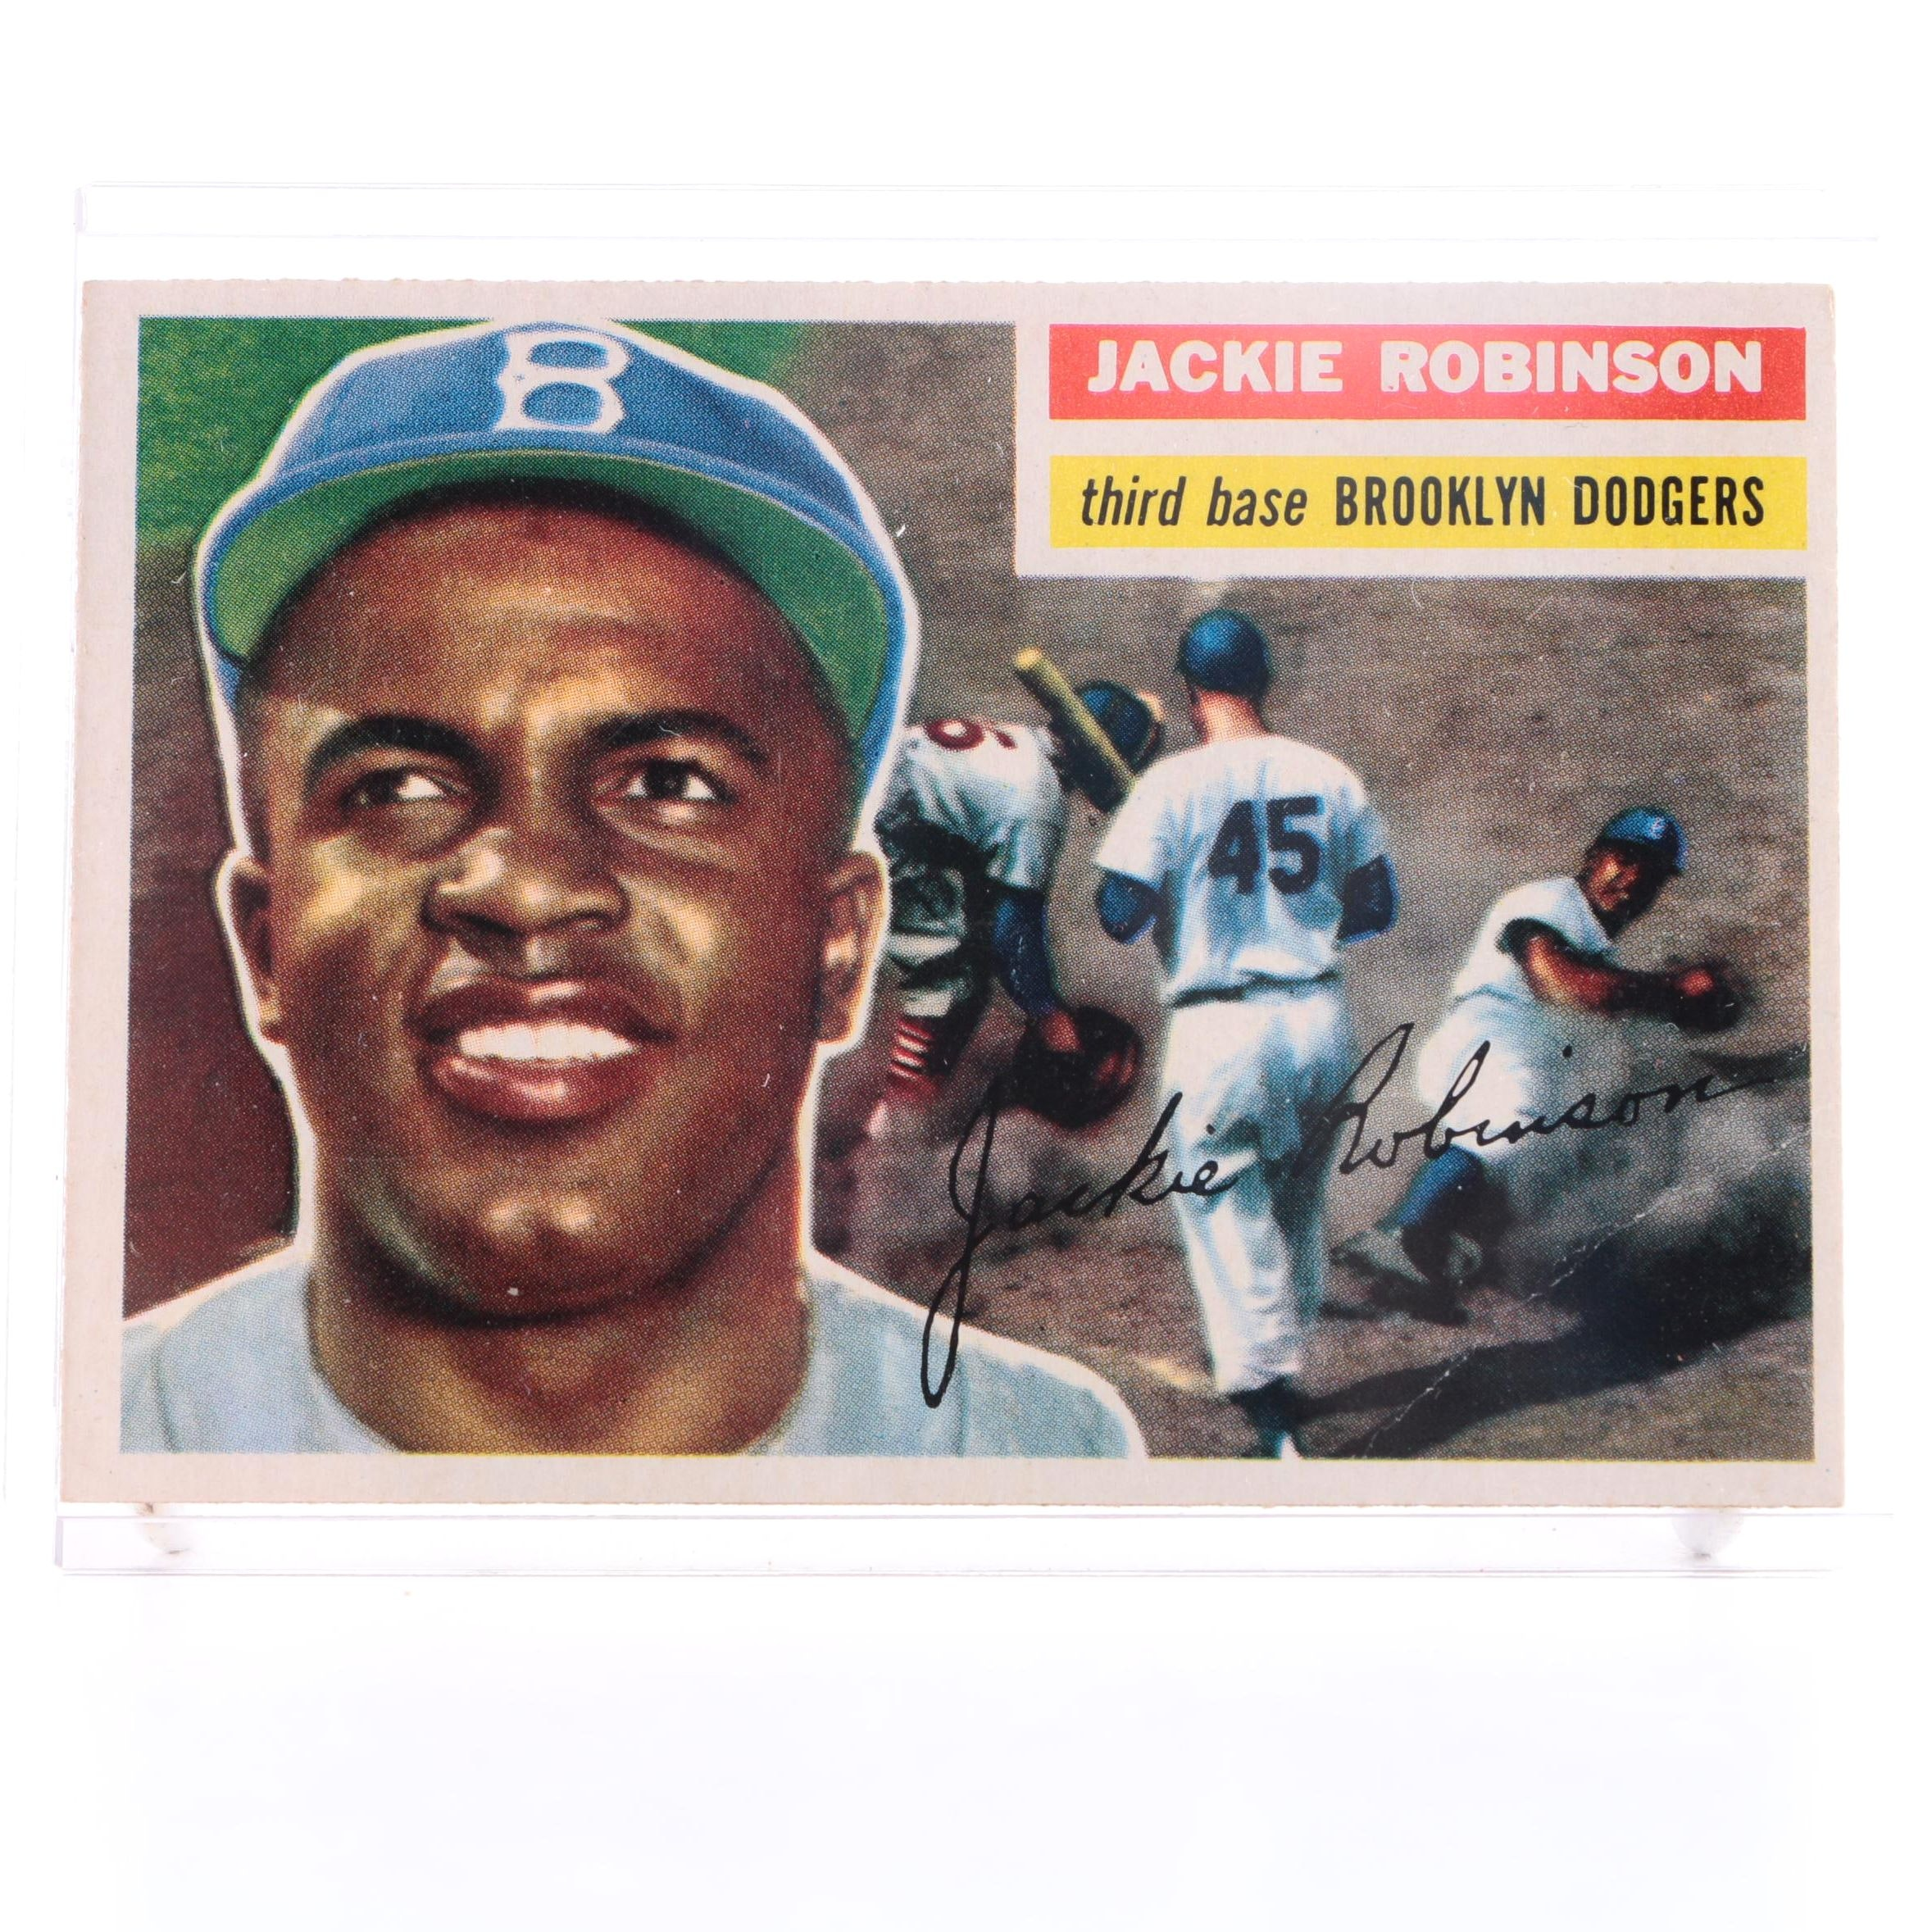 1956 Topps Jackie Robinson Card #30